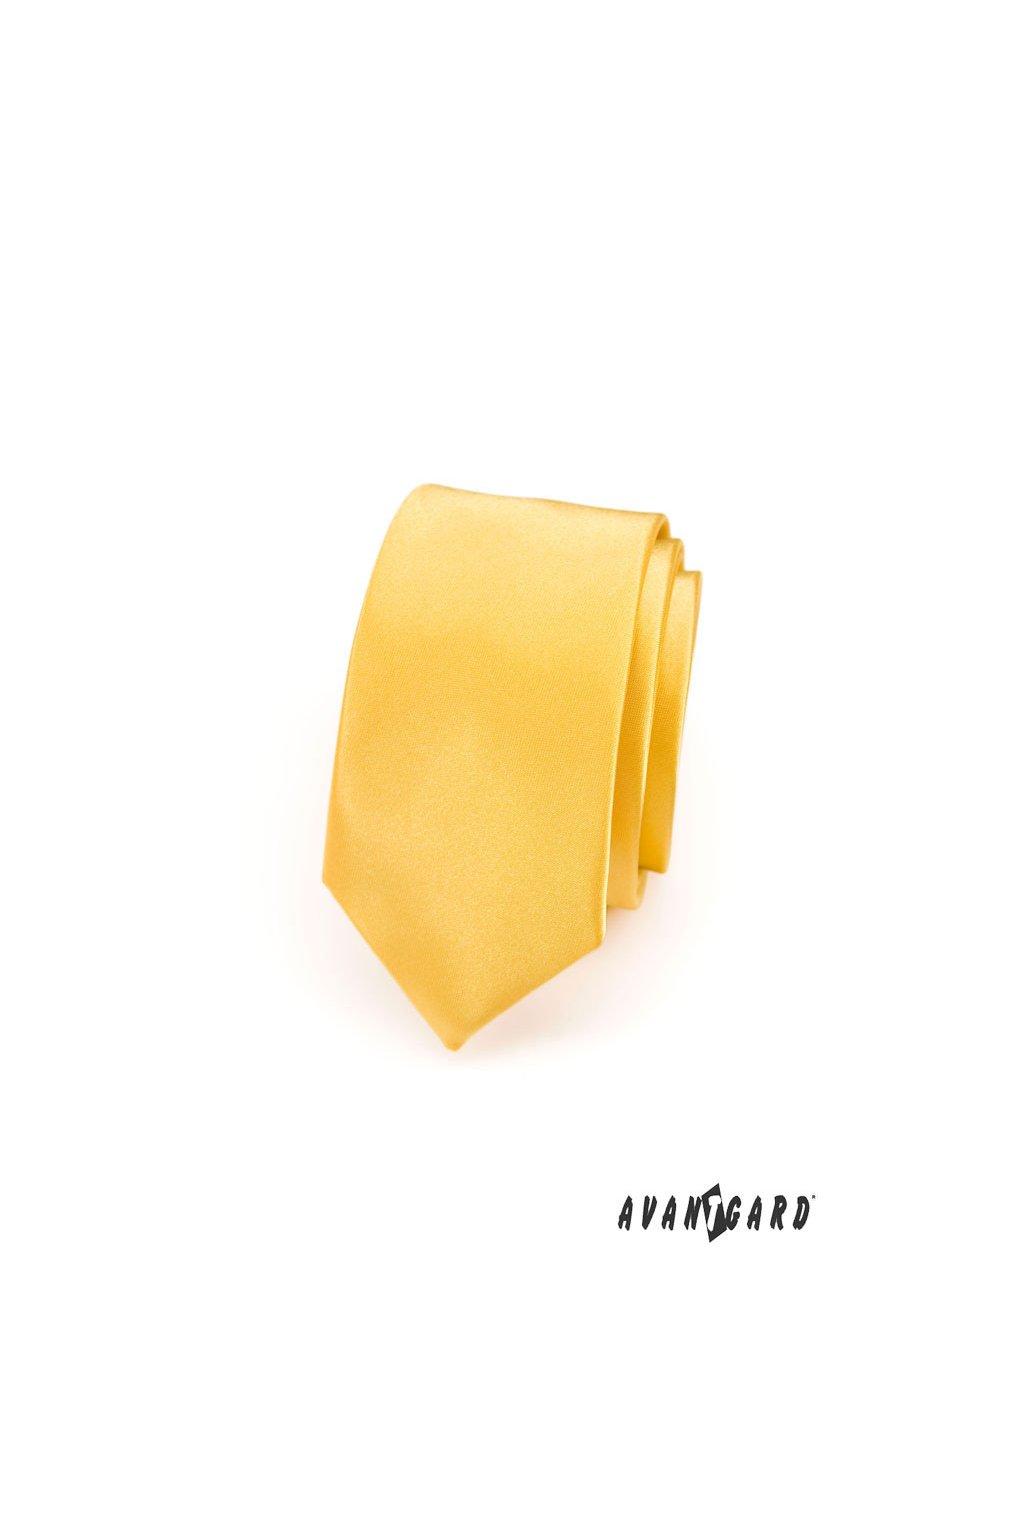 Kravata SLIM AVANTGARD LUX žlutá 571 - 9027